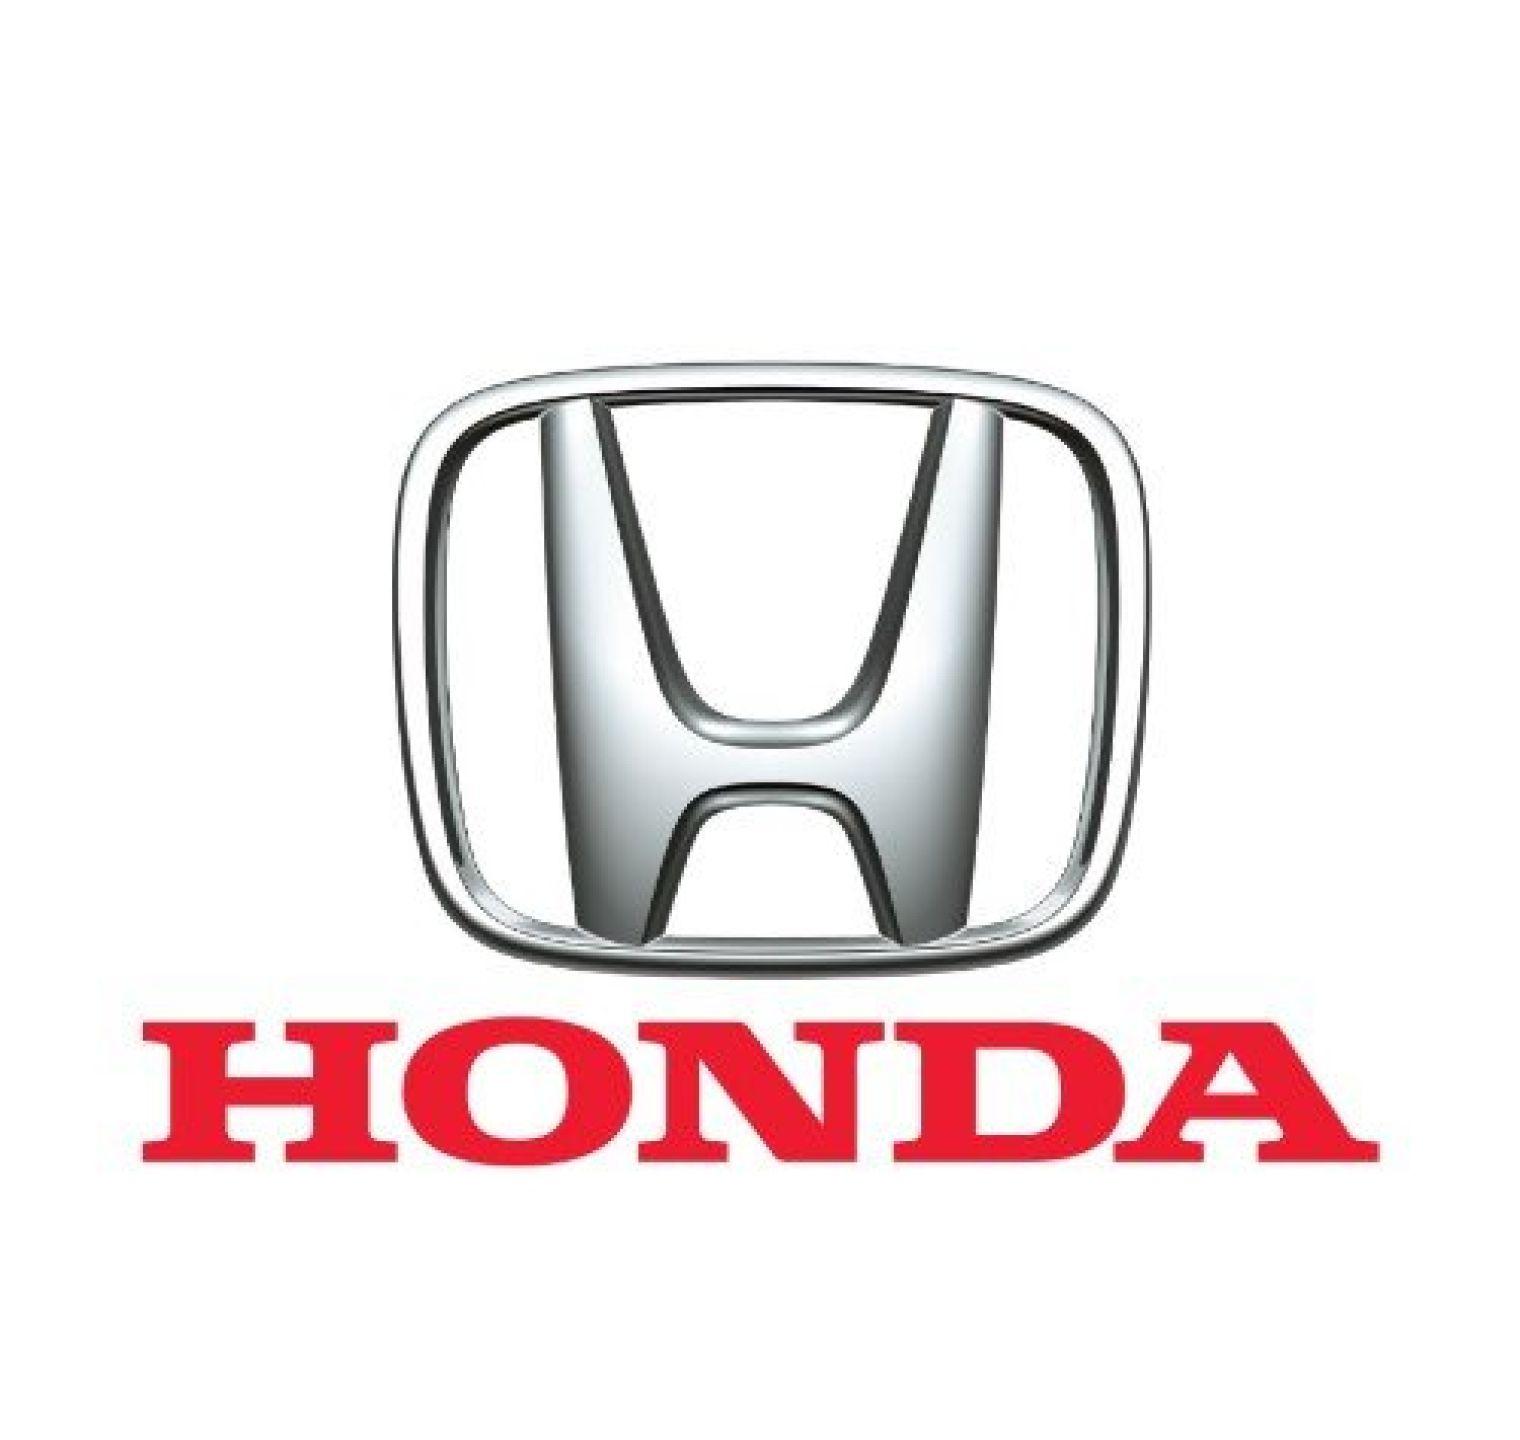 Honda Civic VI Aerodeck (1998 t/m 2001) - achterruitenwisser Valeo Standard